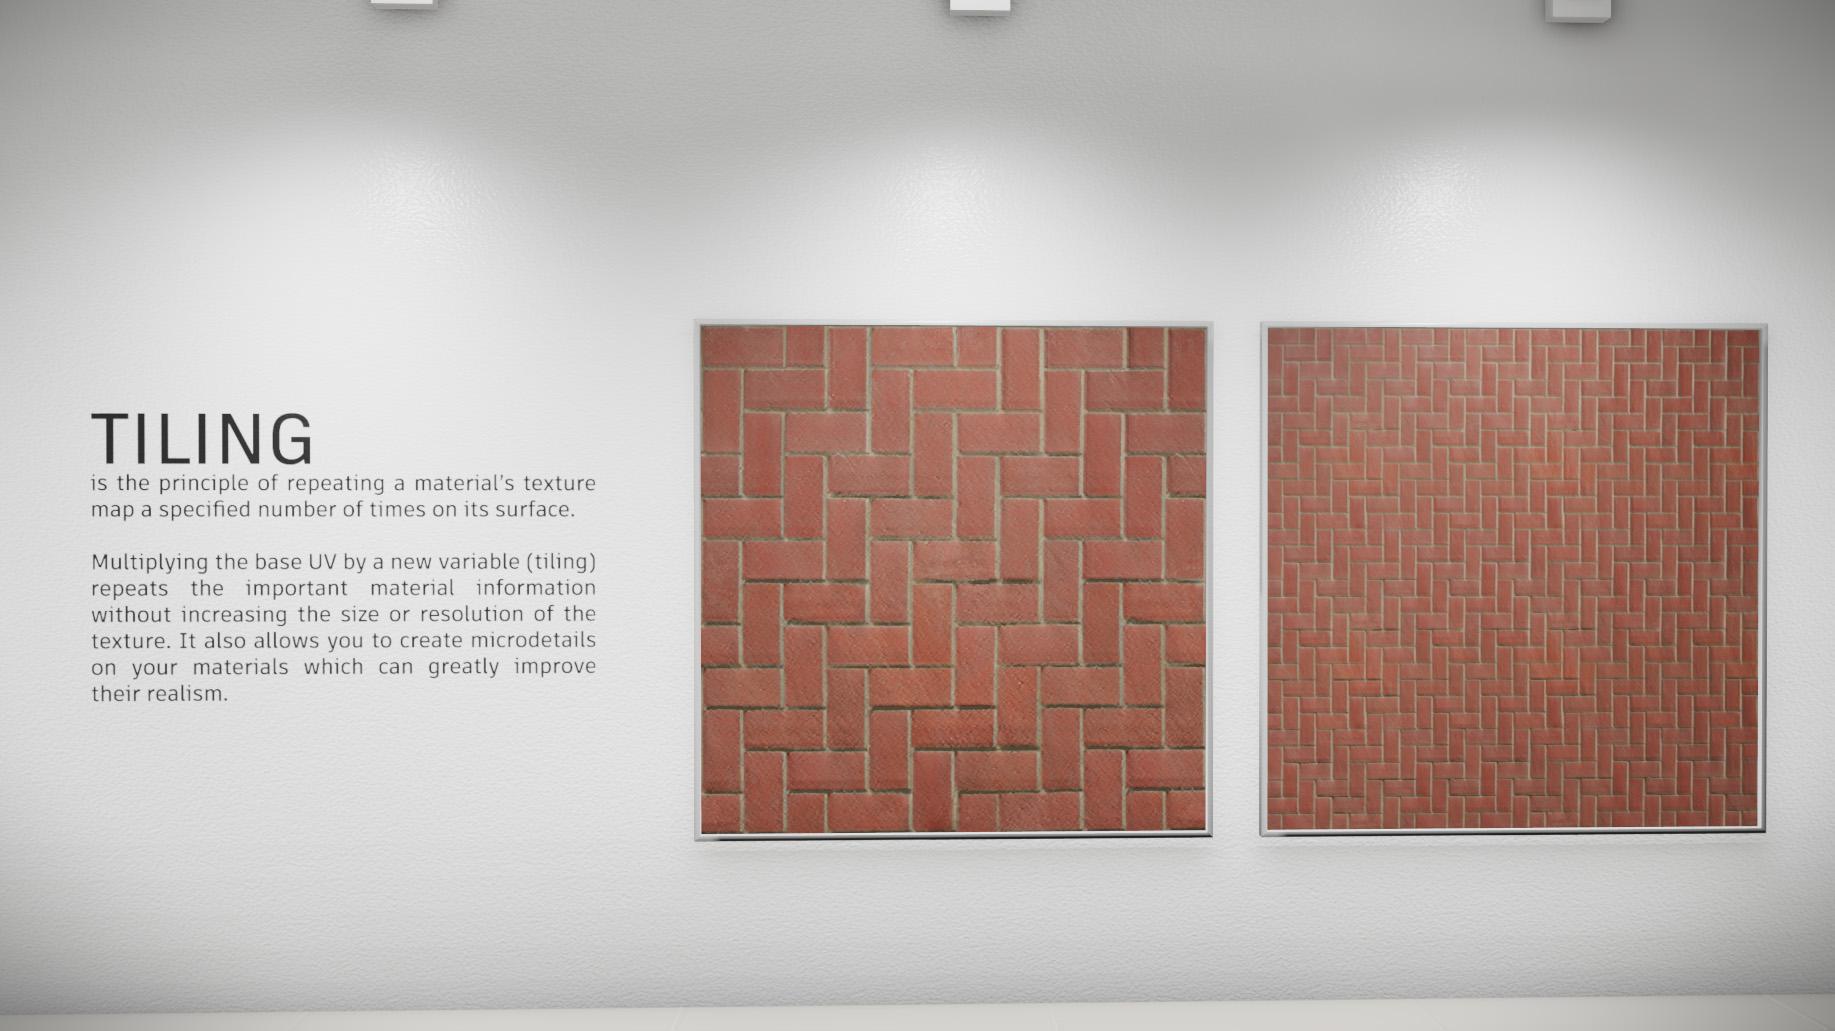 Tiling_PBR.jpg